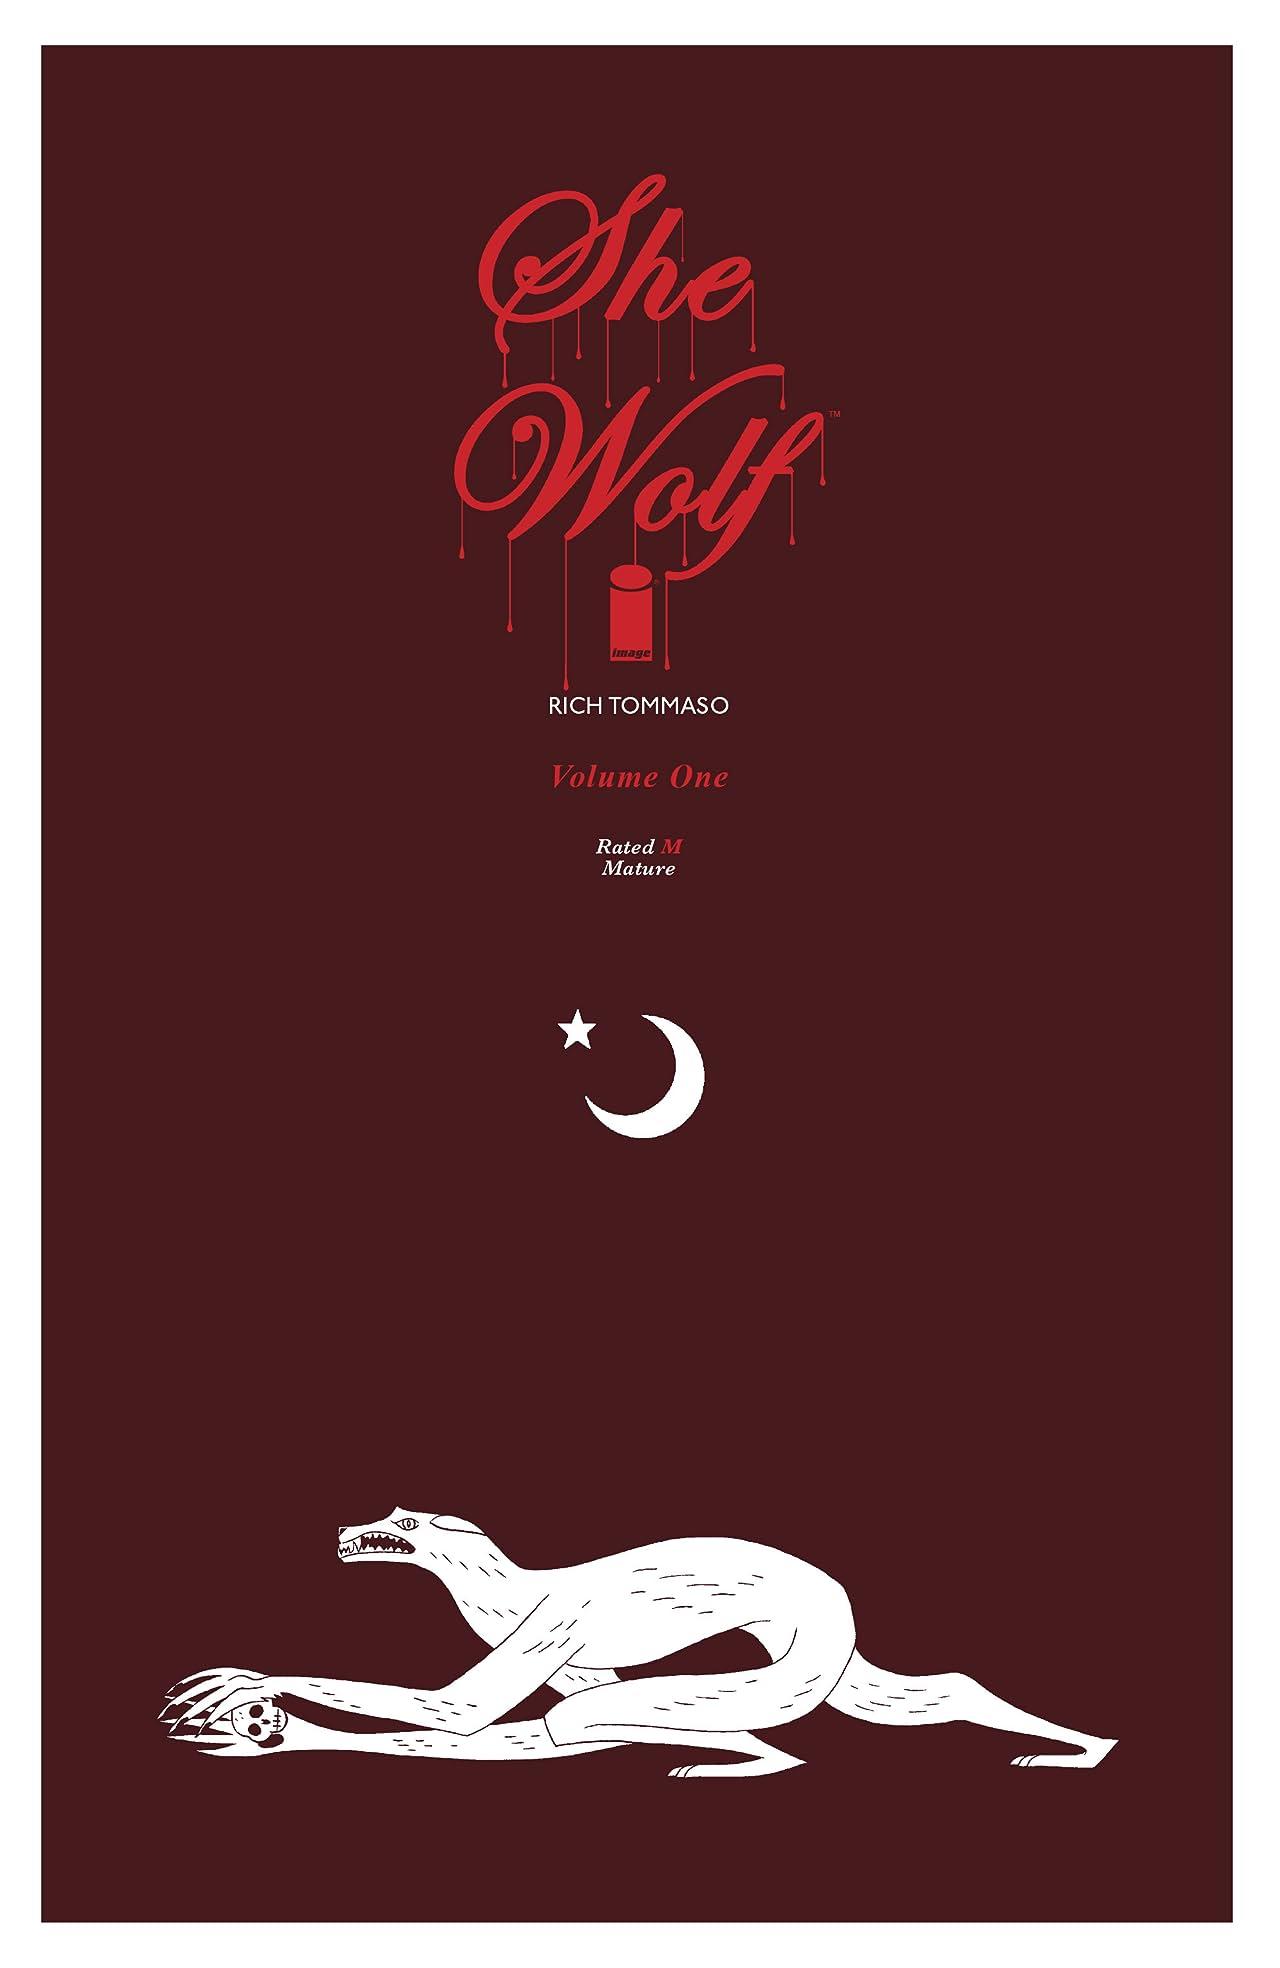 She Wolf Vol. 1